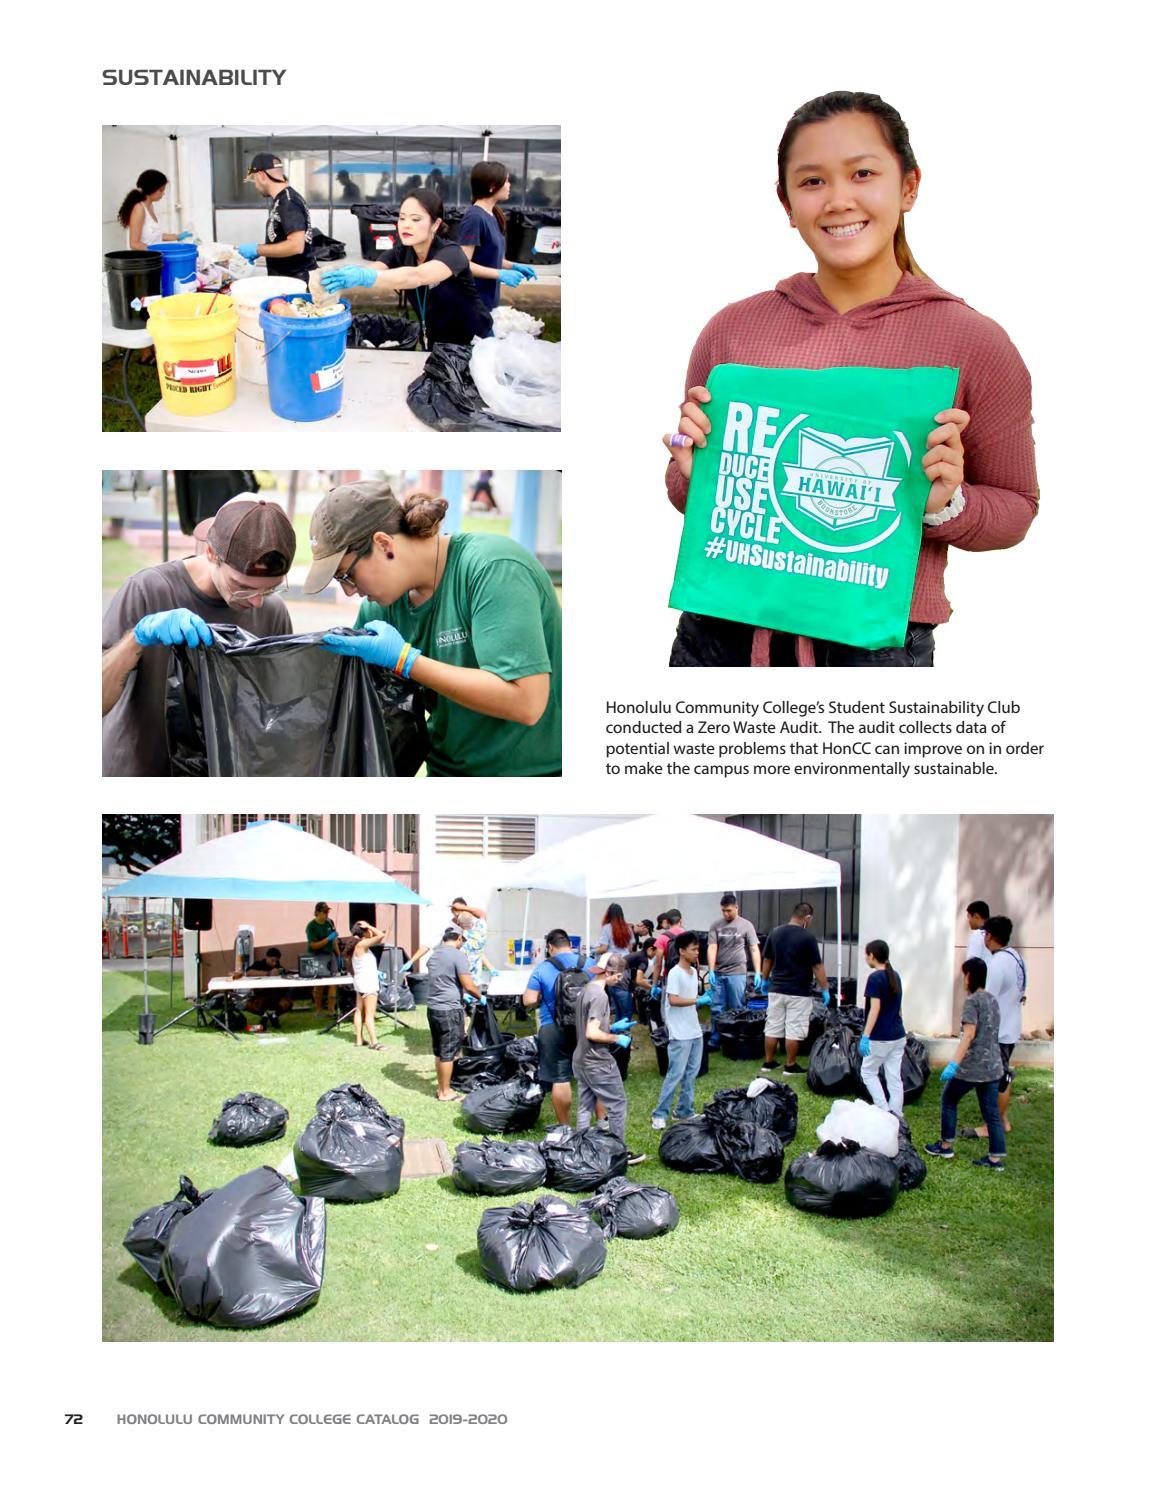 2019 2020 College Catalog by Honolulu Community College issuu